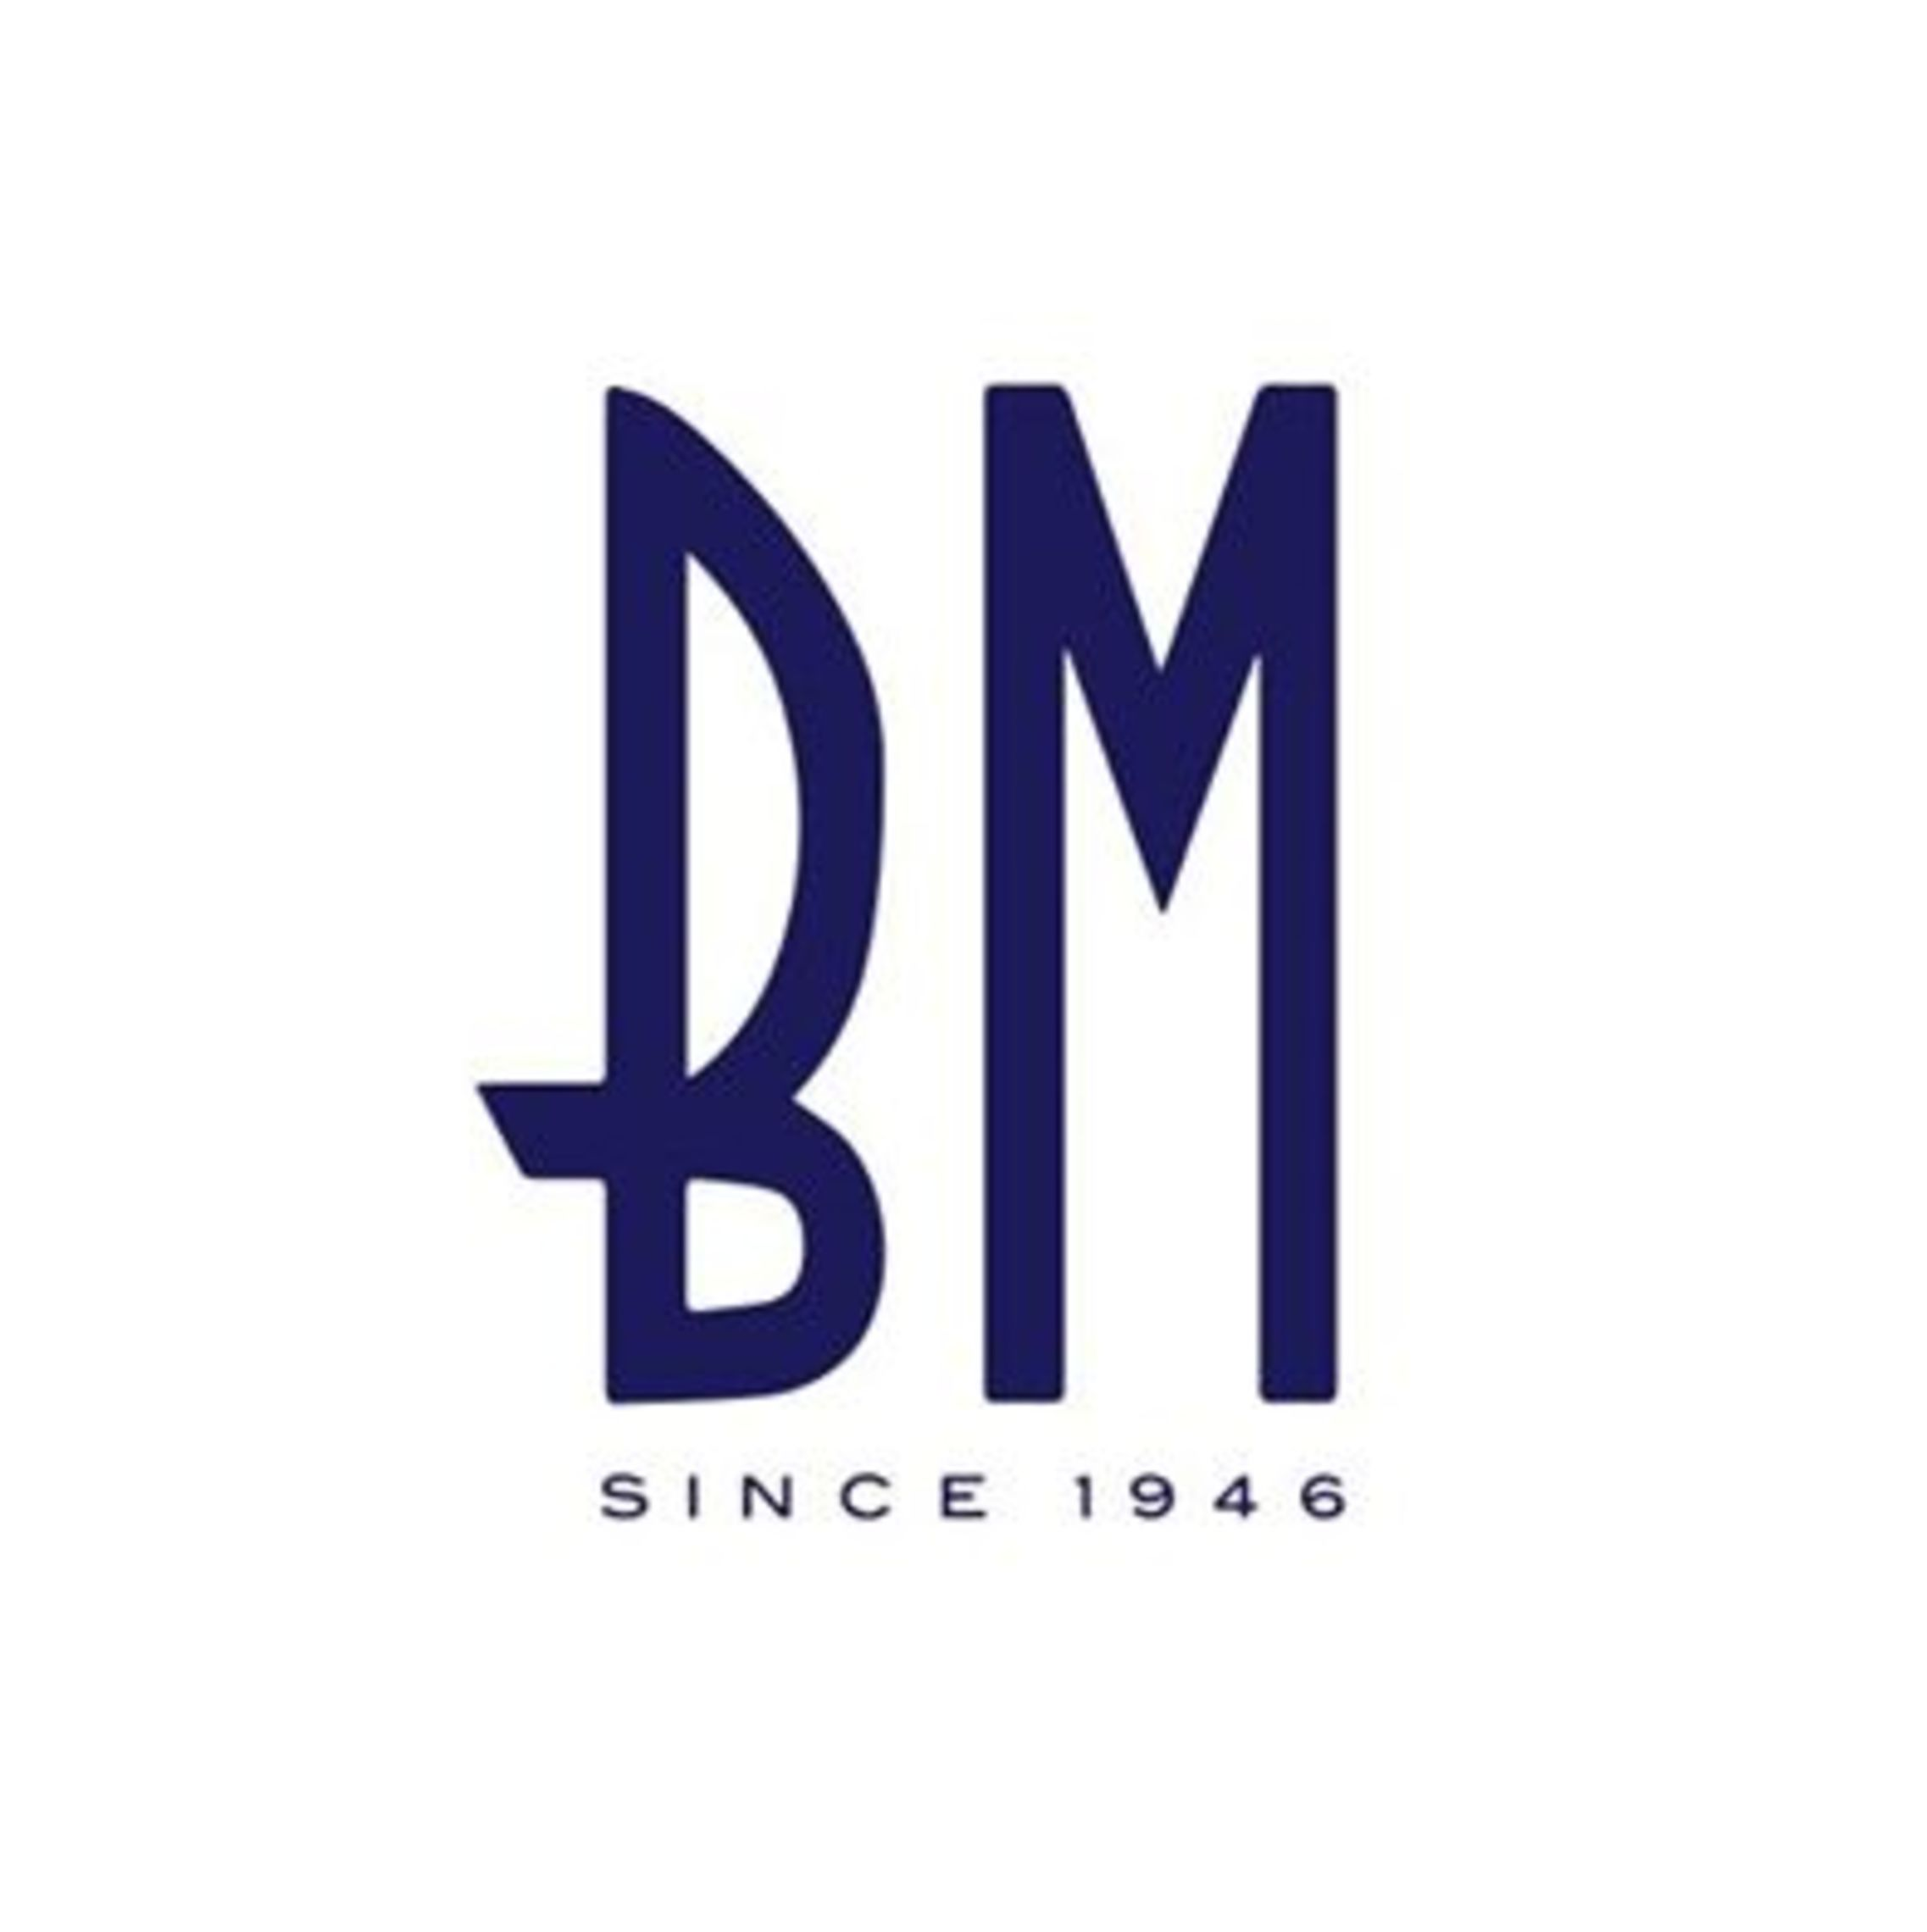 bianca mosca limited- company logo